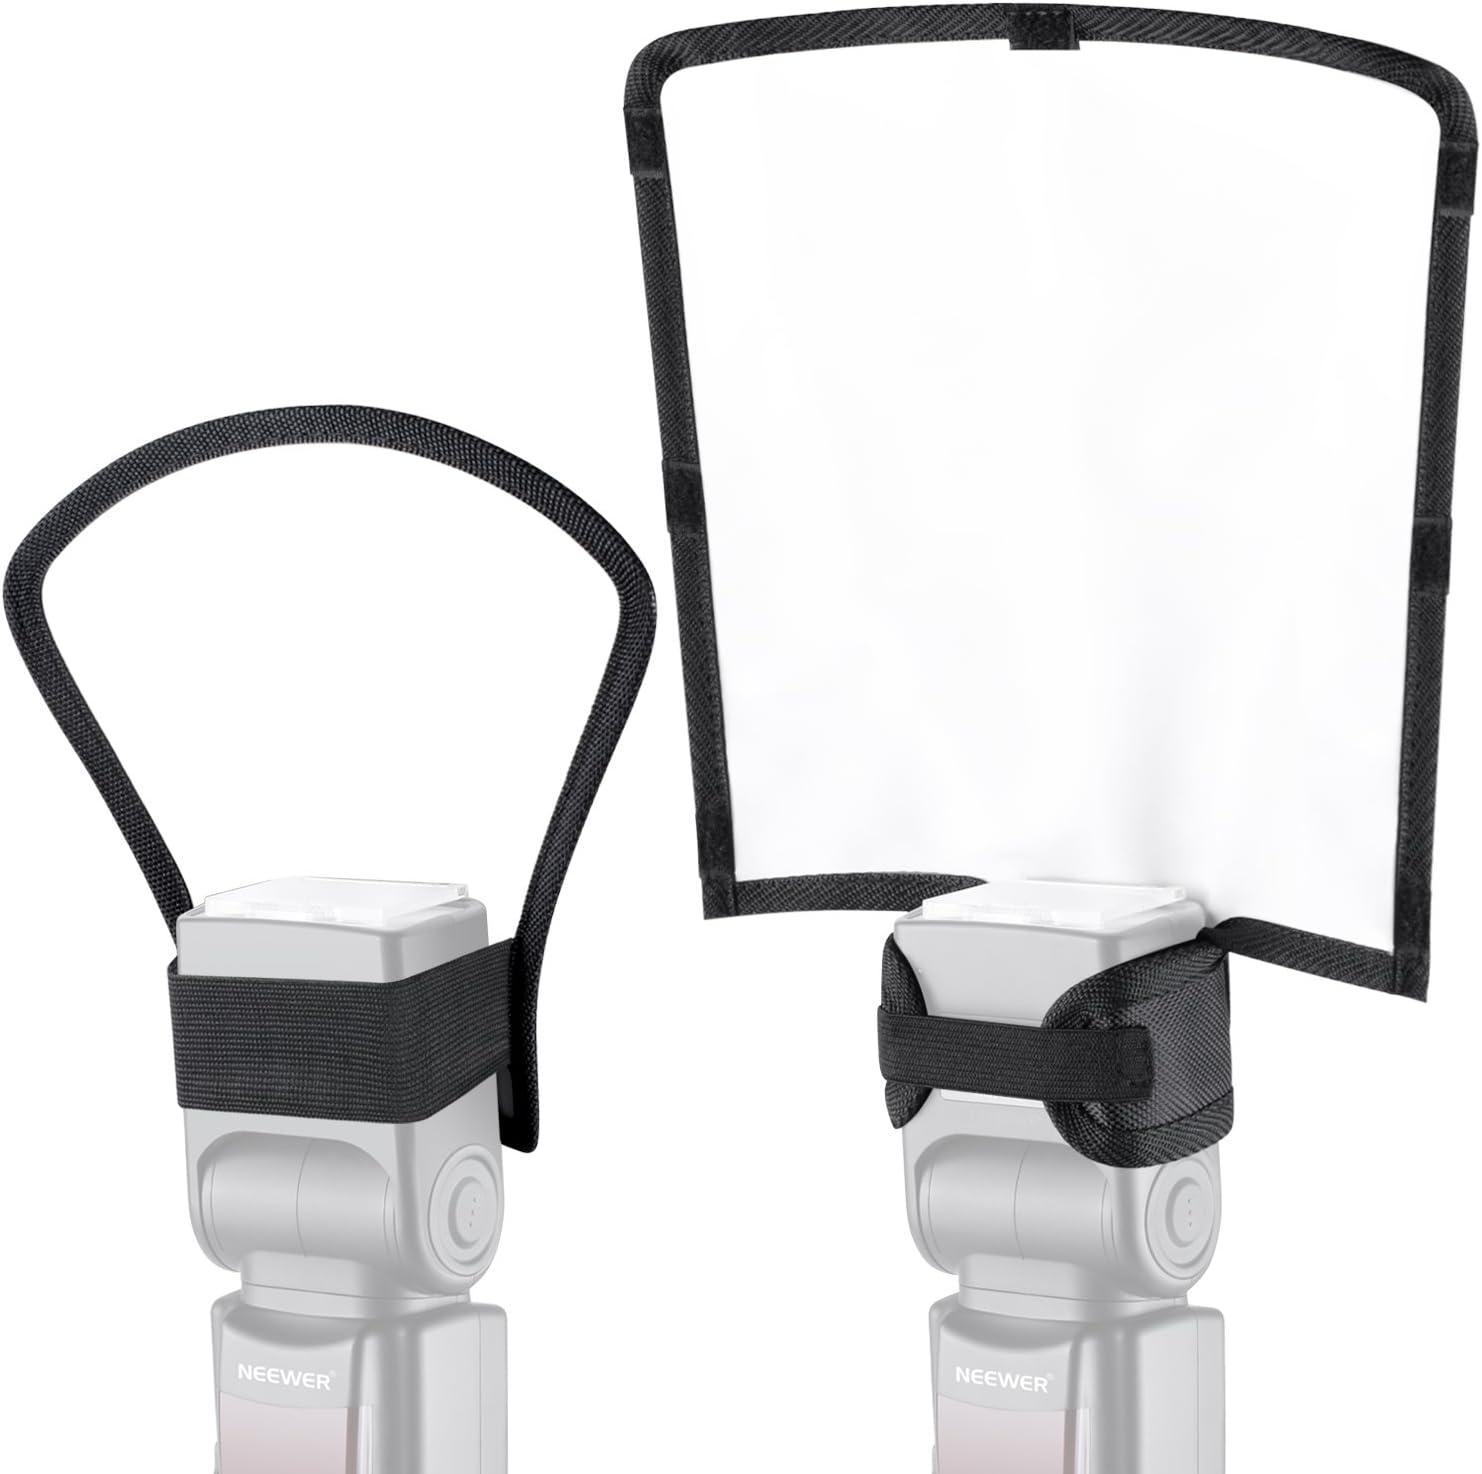 Reflector Photo Plus 1-piece Flash Diffuser